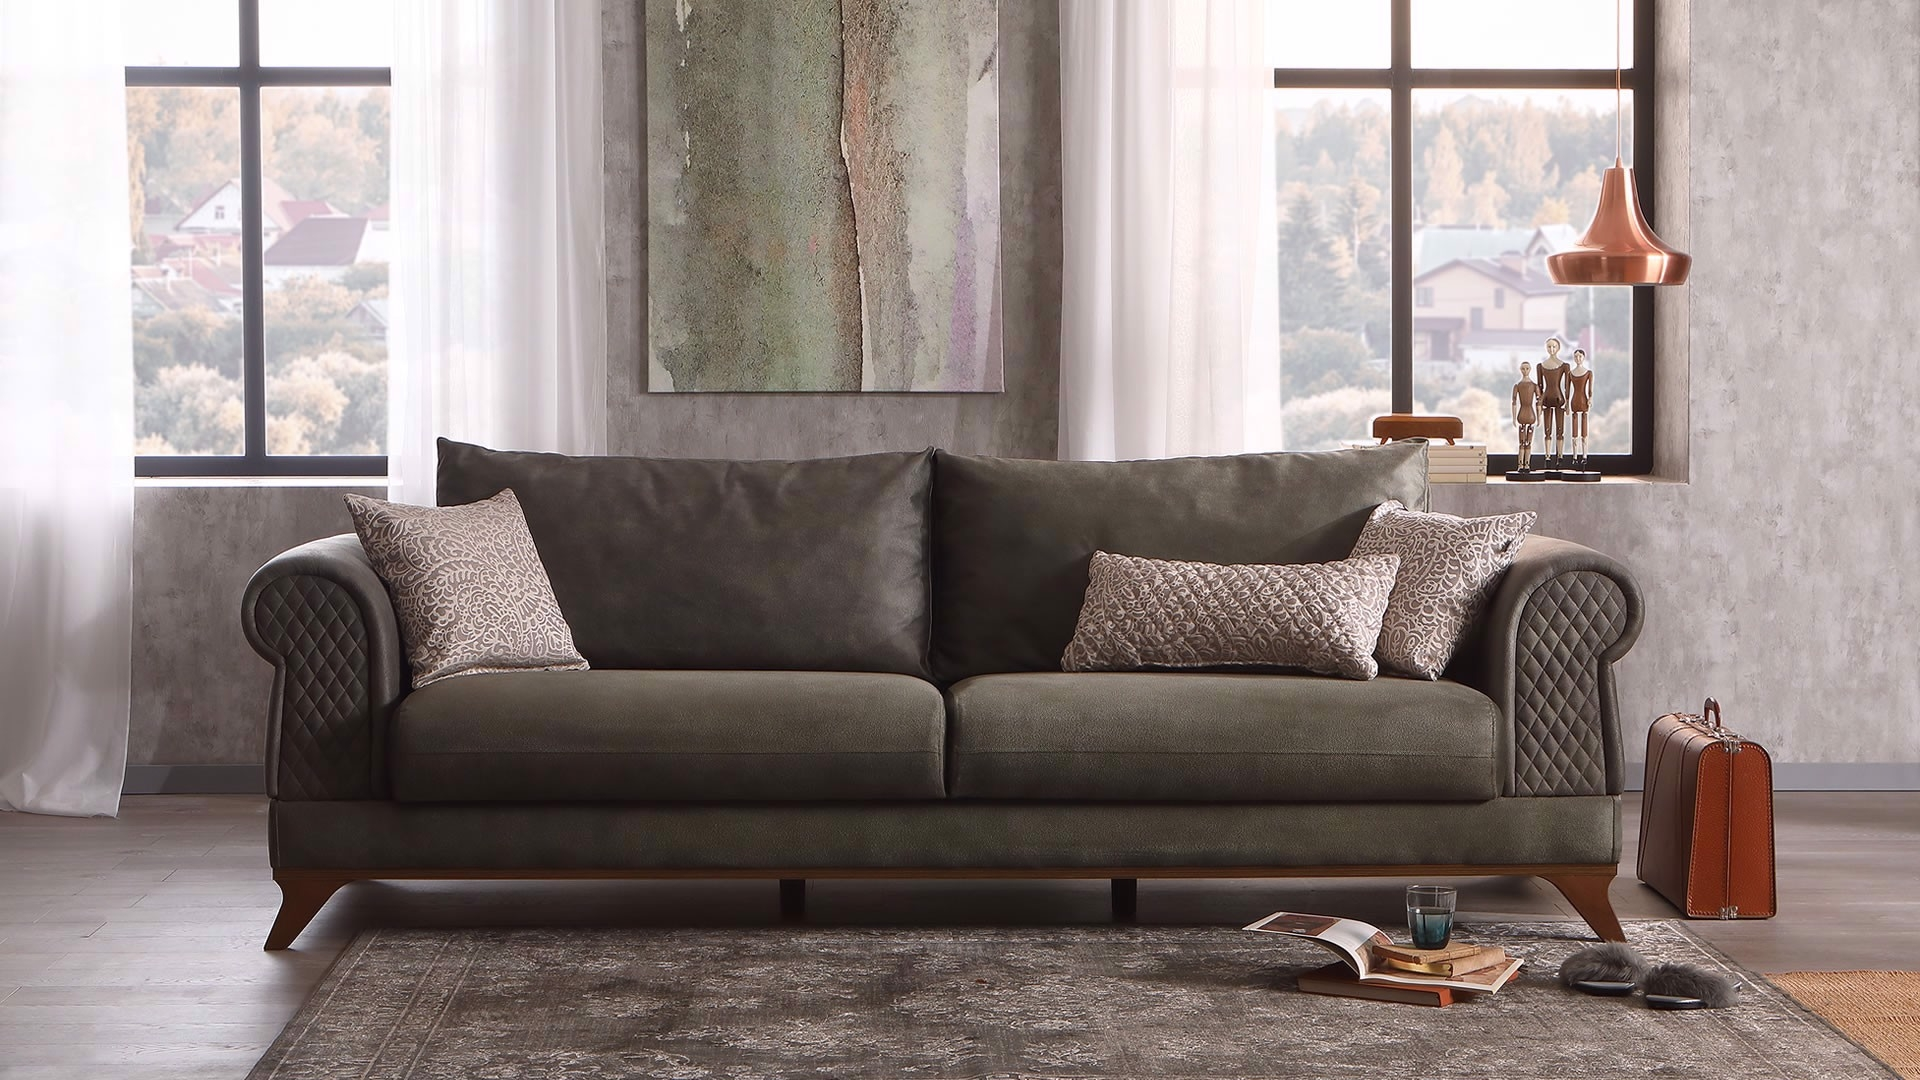 Canapea extensibila cu lada de depozitare, tapitata cu stofa, 3 locuri Raveno Verde Olive, l246xA100xH81 cm